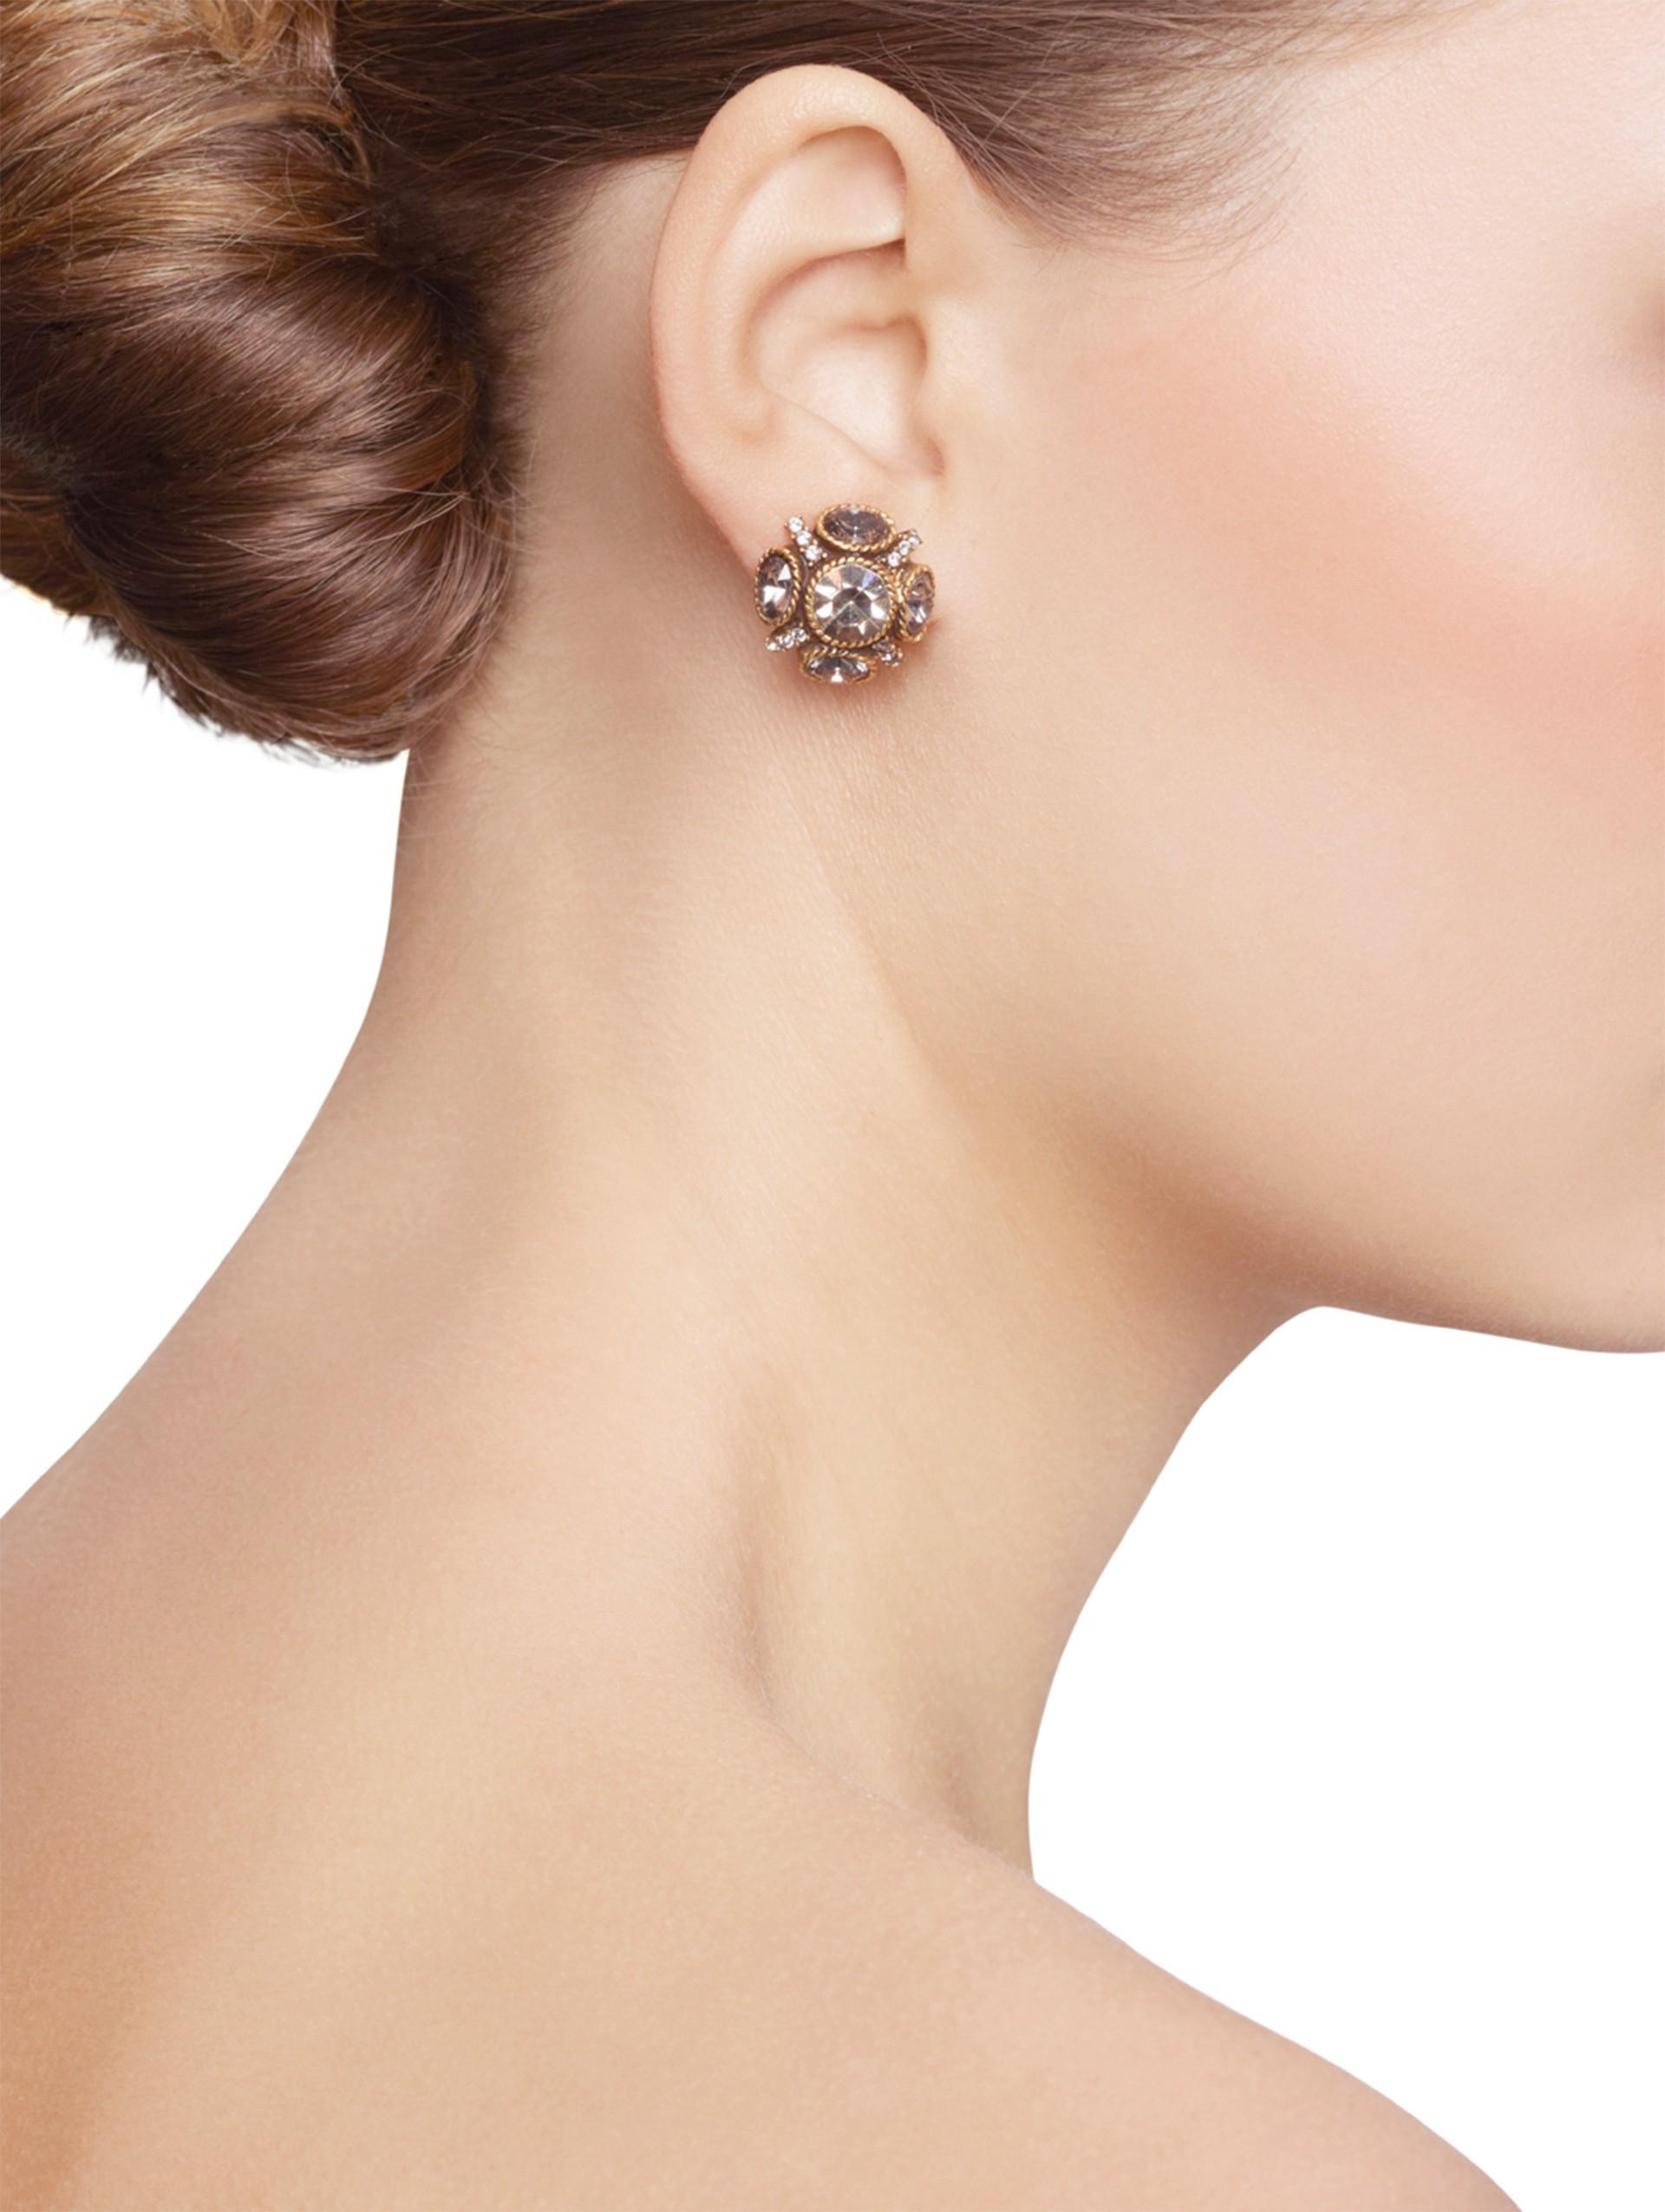 Oscar De La Renta Classic Crystal Button Earrings mscPOS